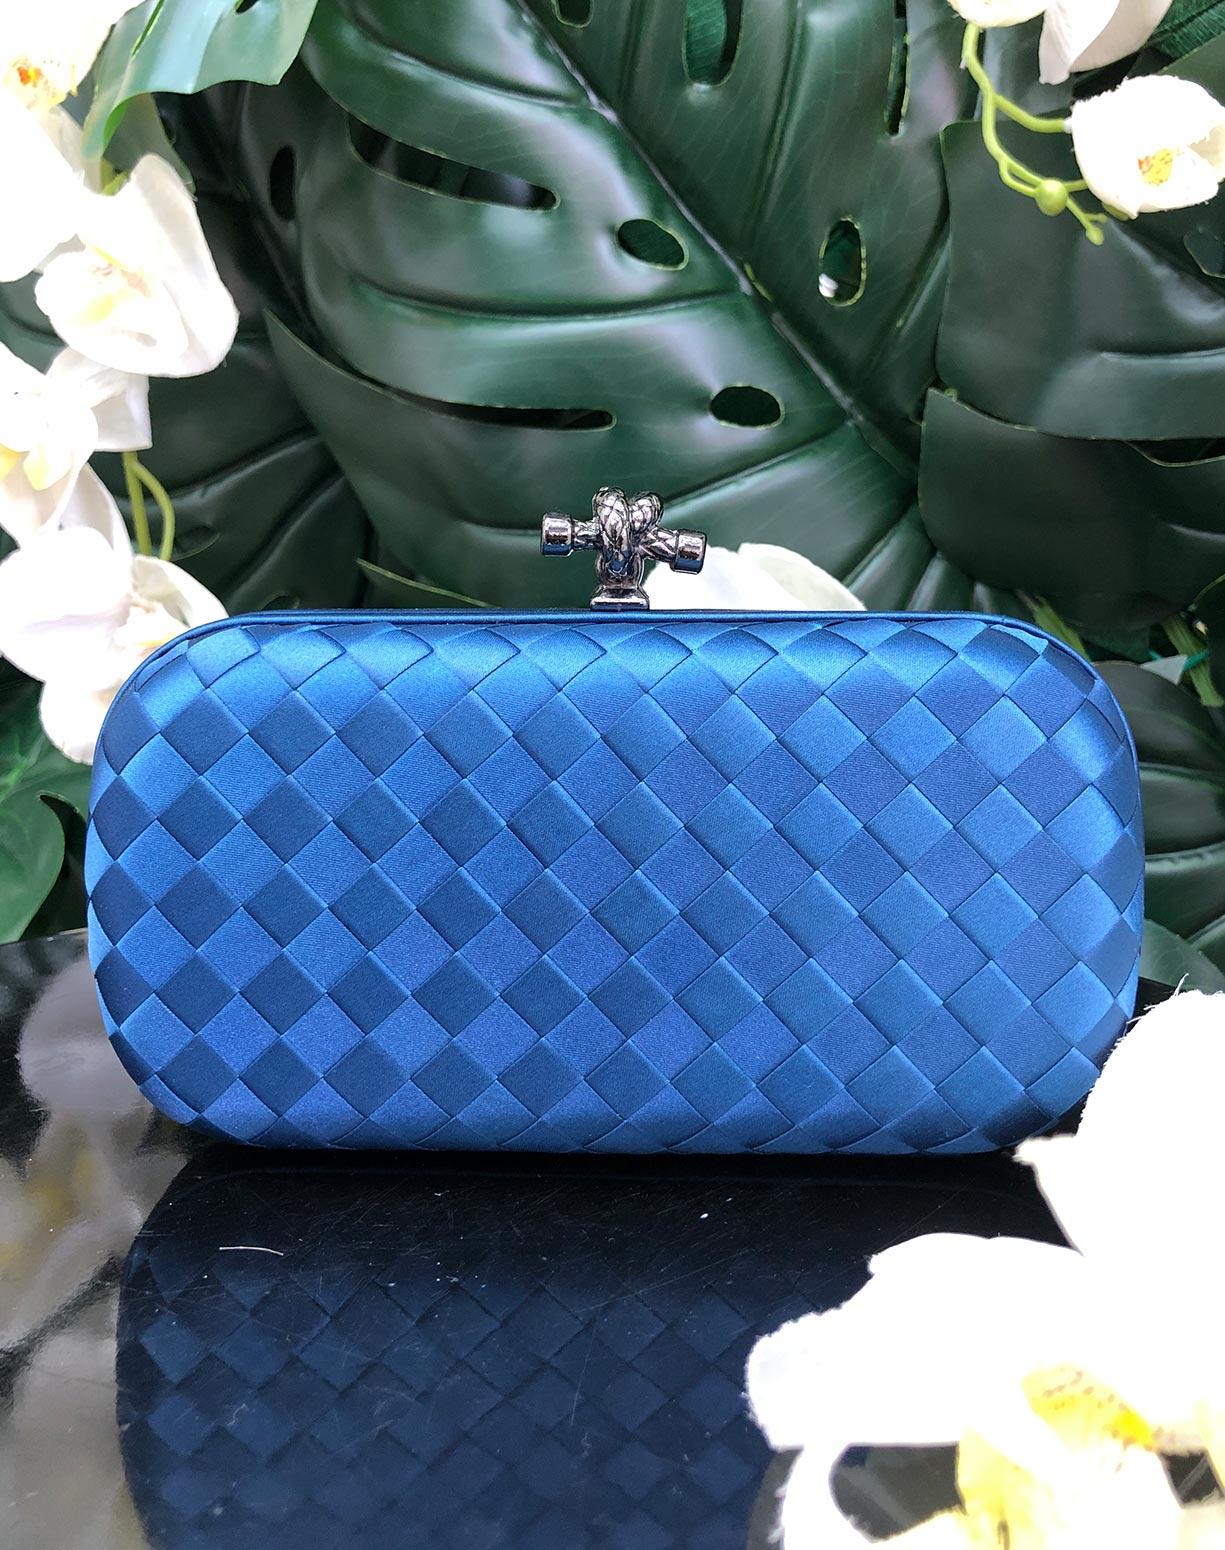 Bottega Azul Marinho